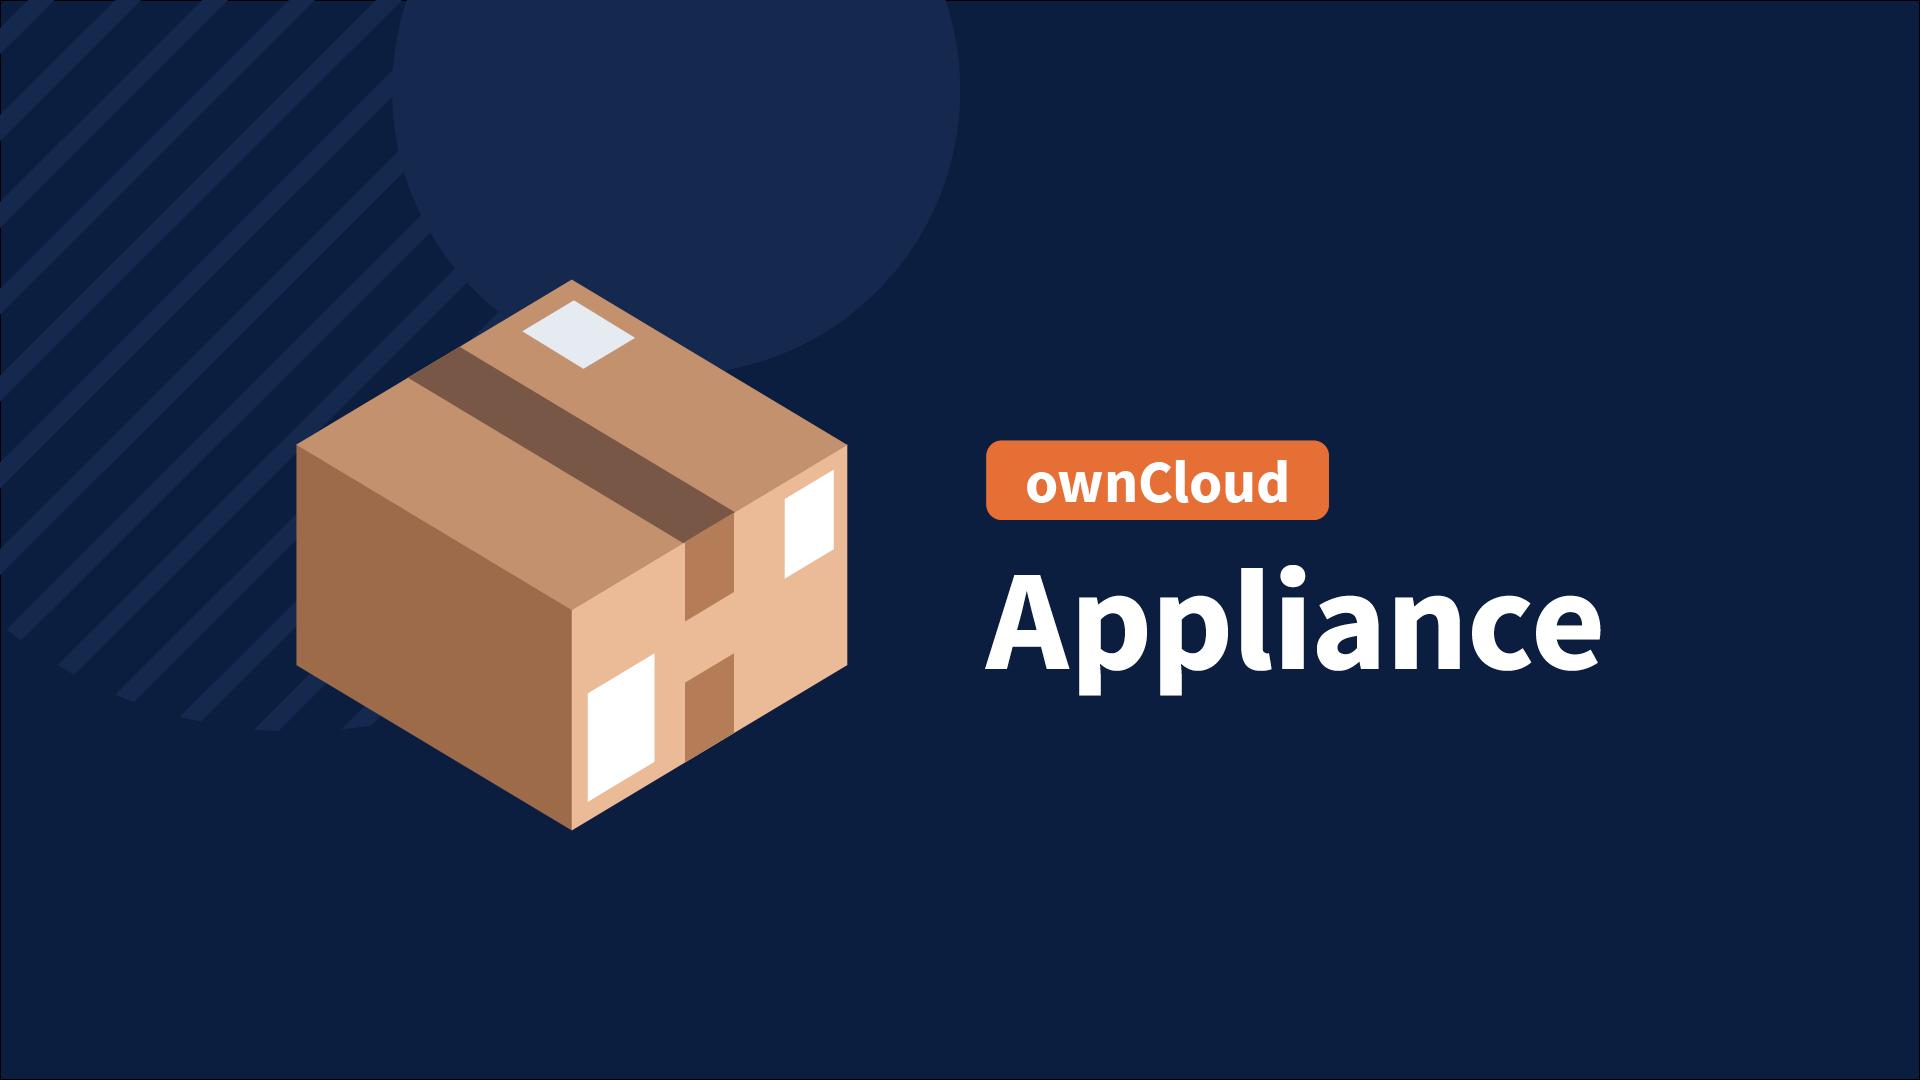 ownCloud Virtual Machine Appliance